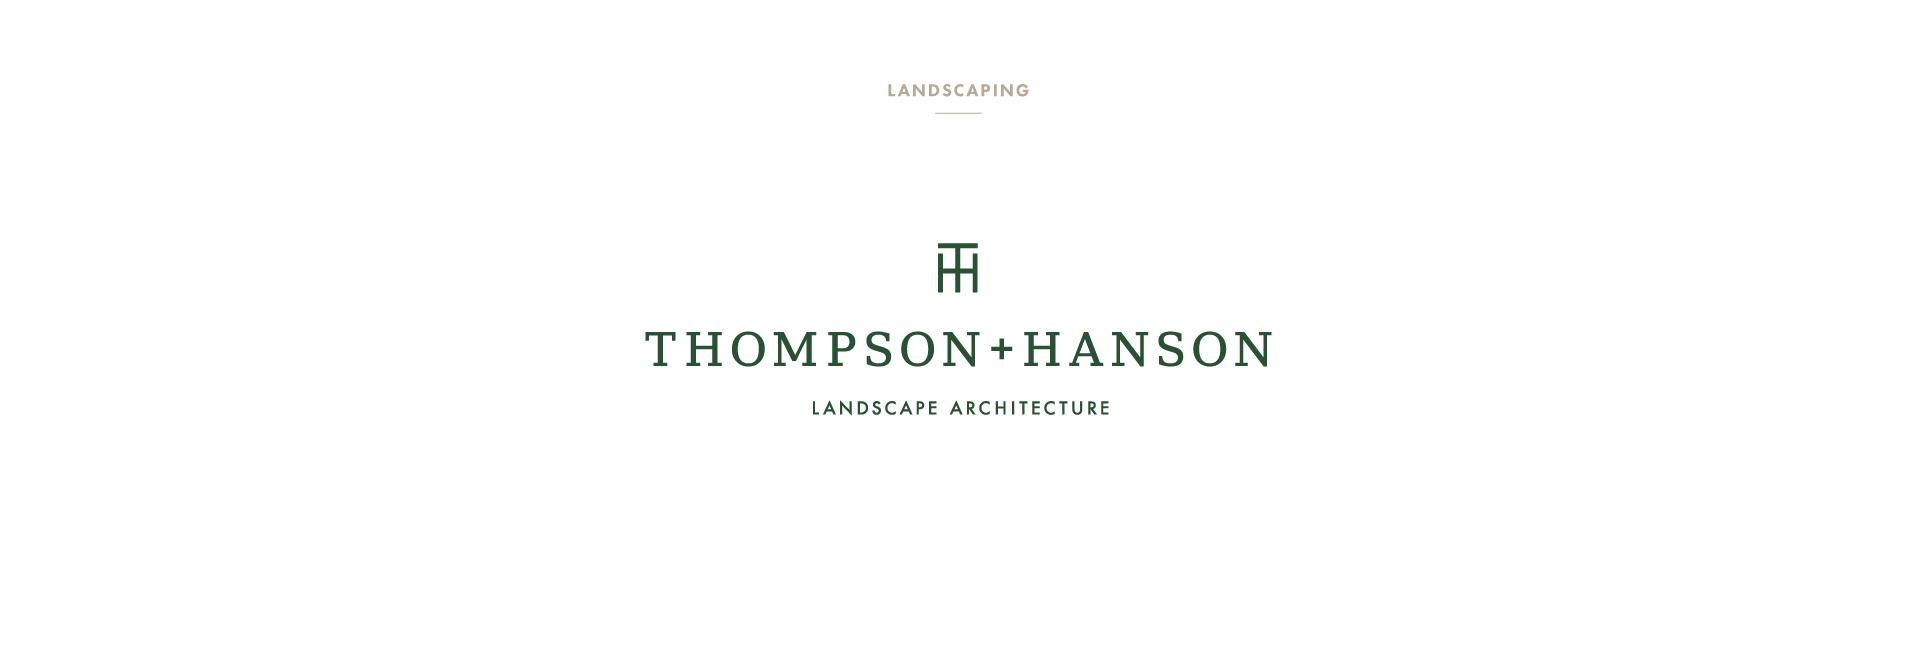 Creative_Retail_Packaging_Thompson_Hanson_Branding_2.jpg